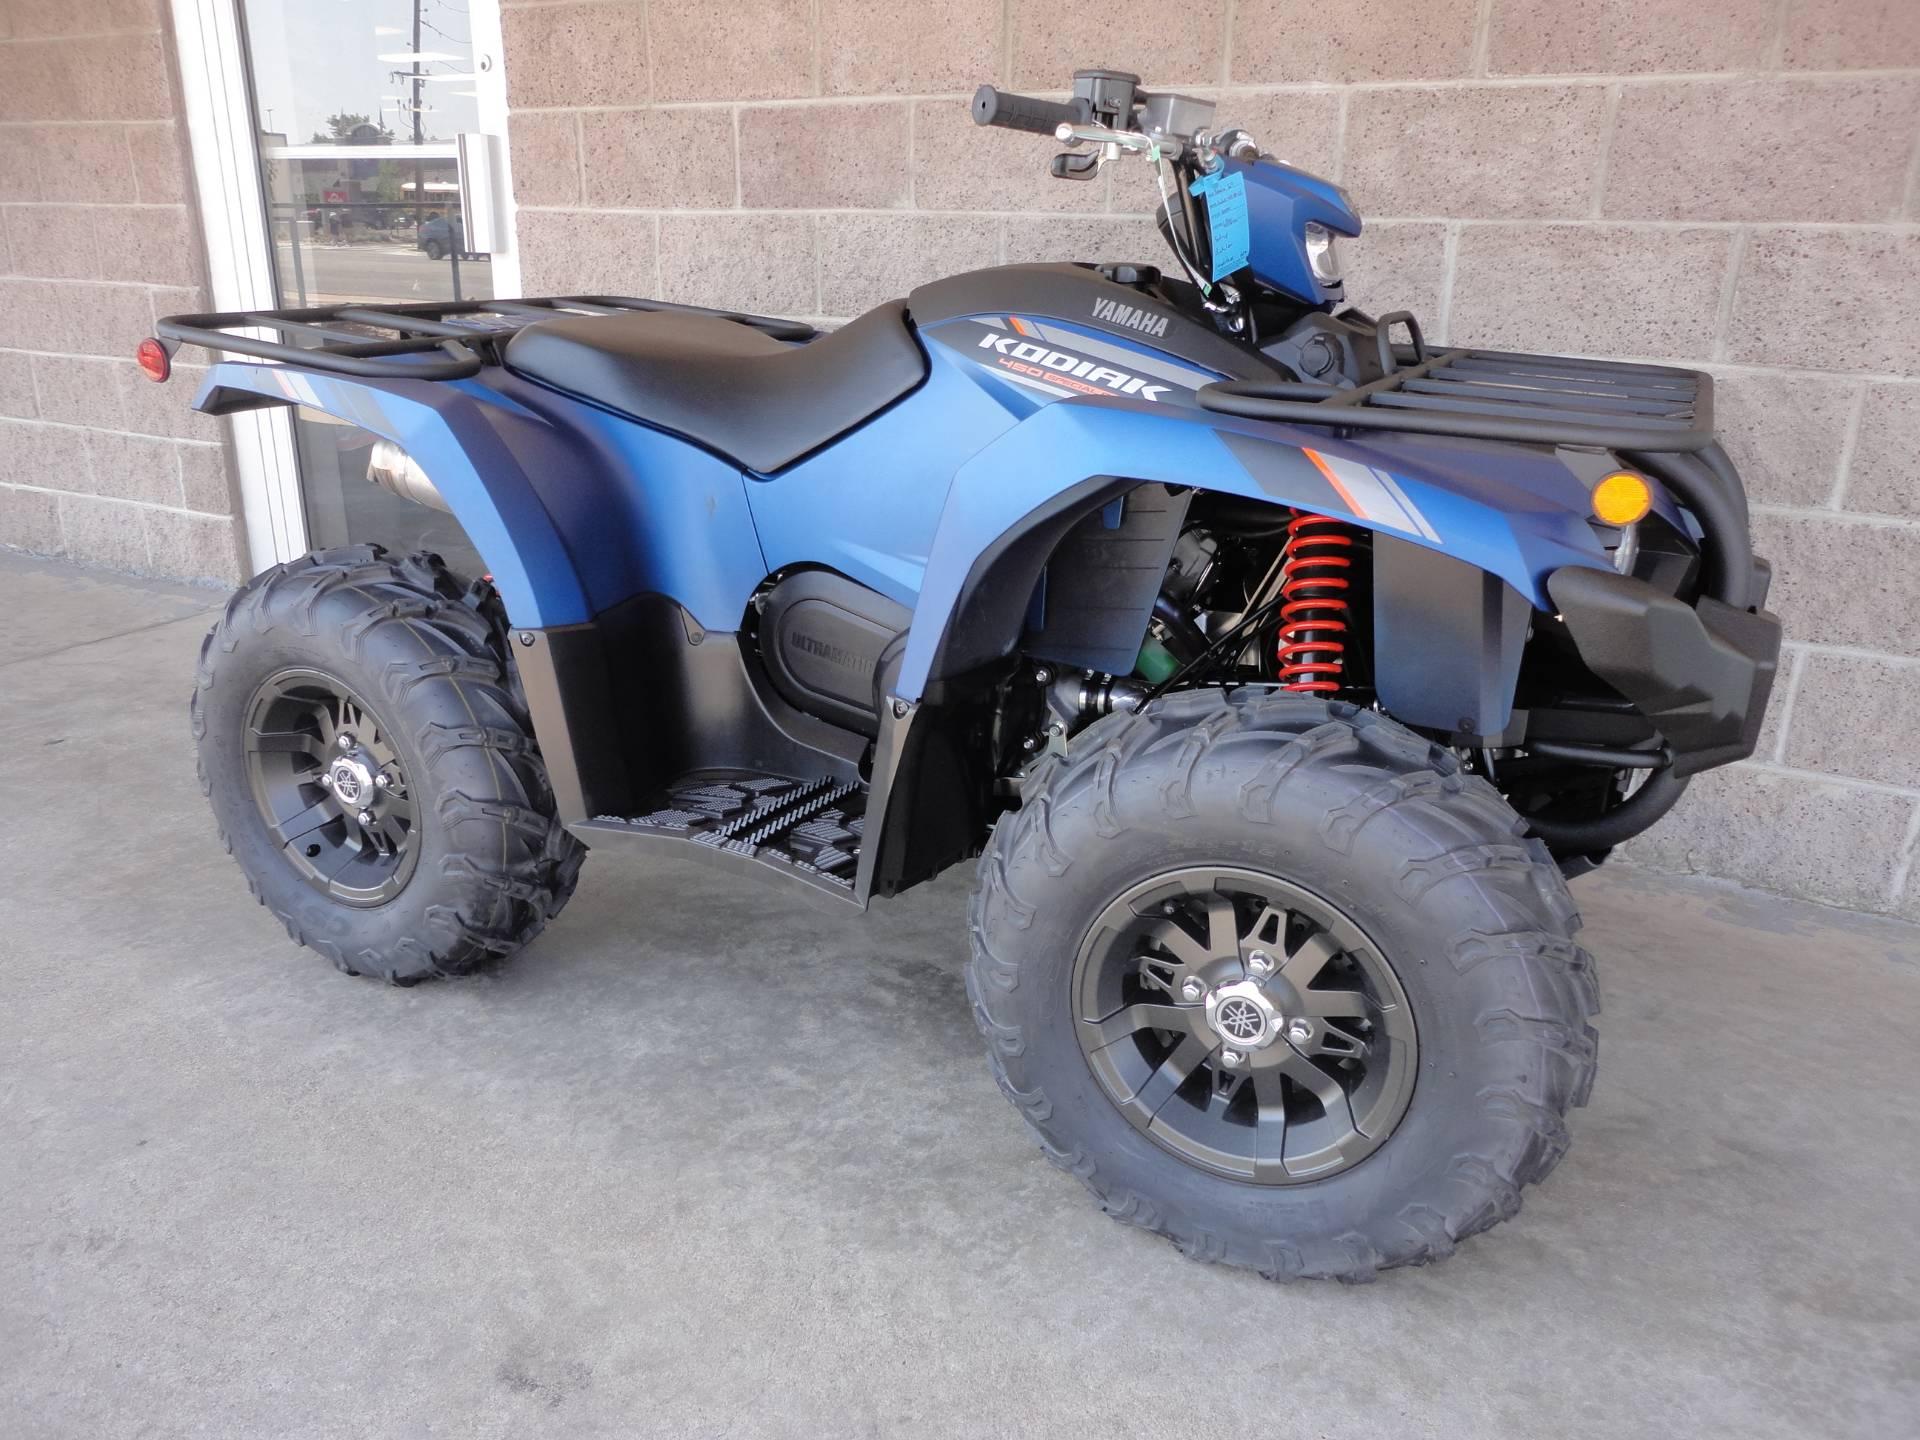 2019 Yamaha Kodiak 450 Eps Se Atvs Denver Colorado V0630 Fuel Filter In